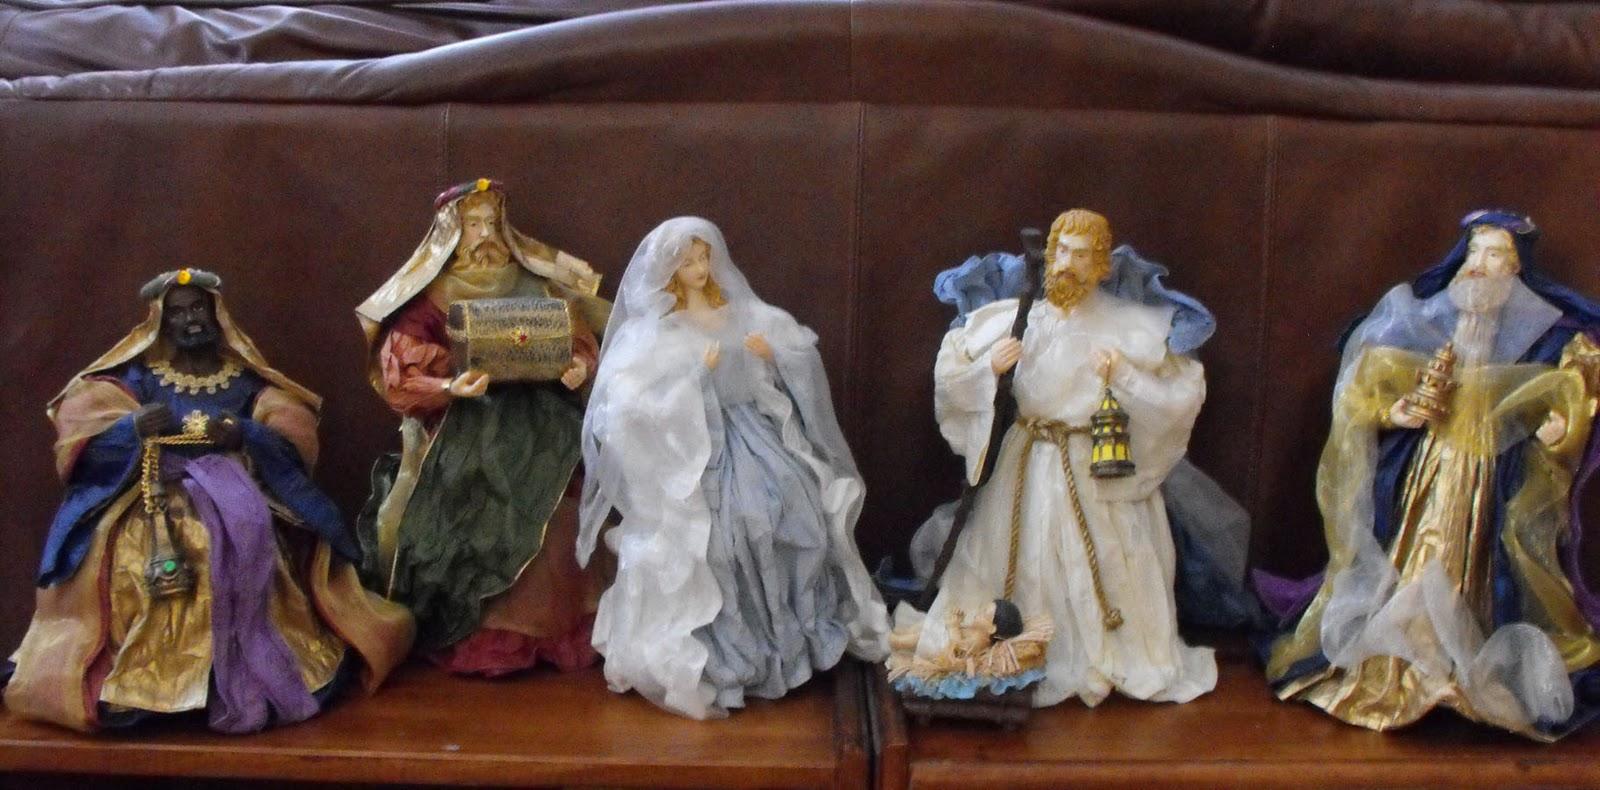 Nativity Set Costco my Nativity Set Given to me